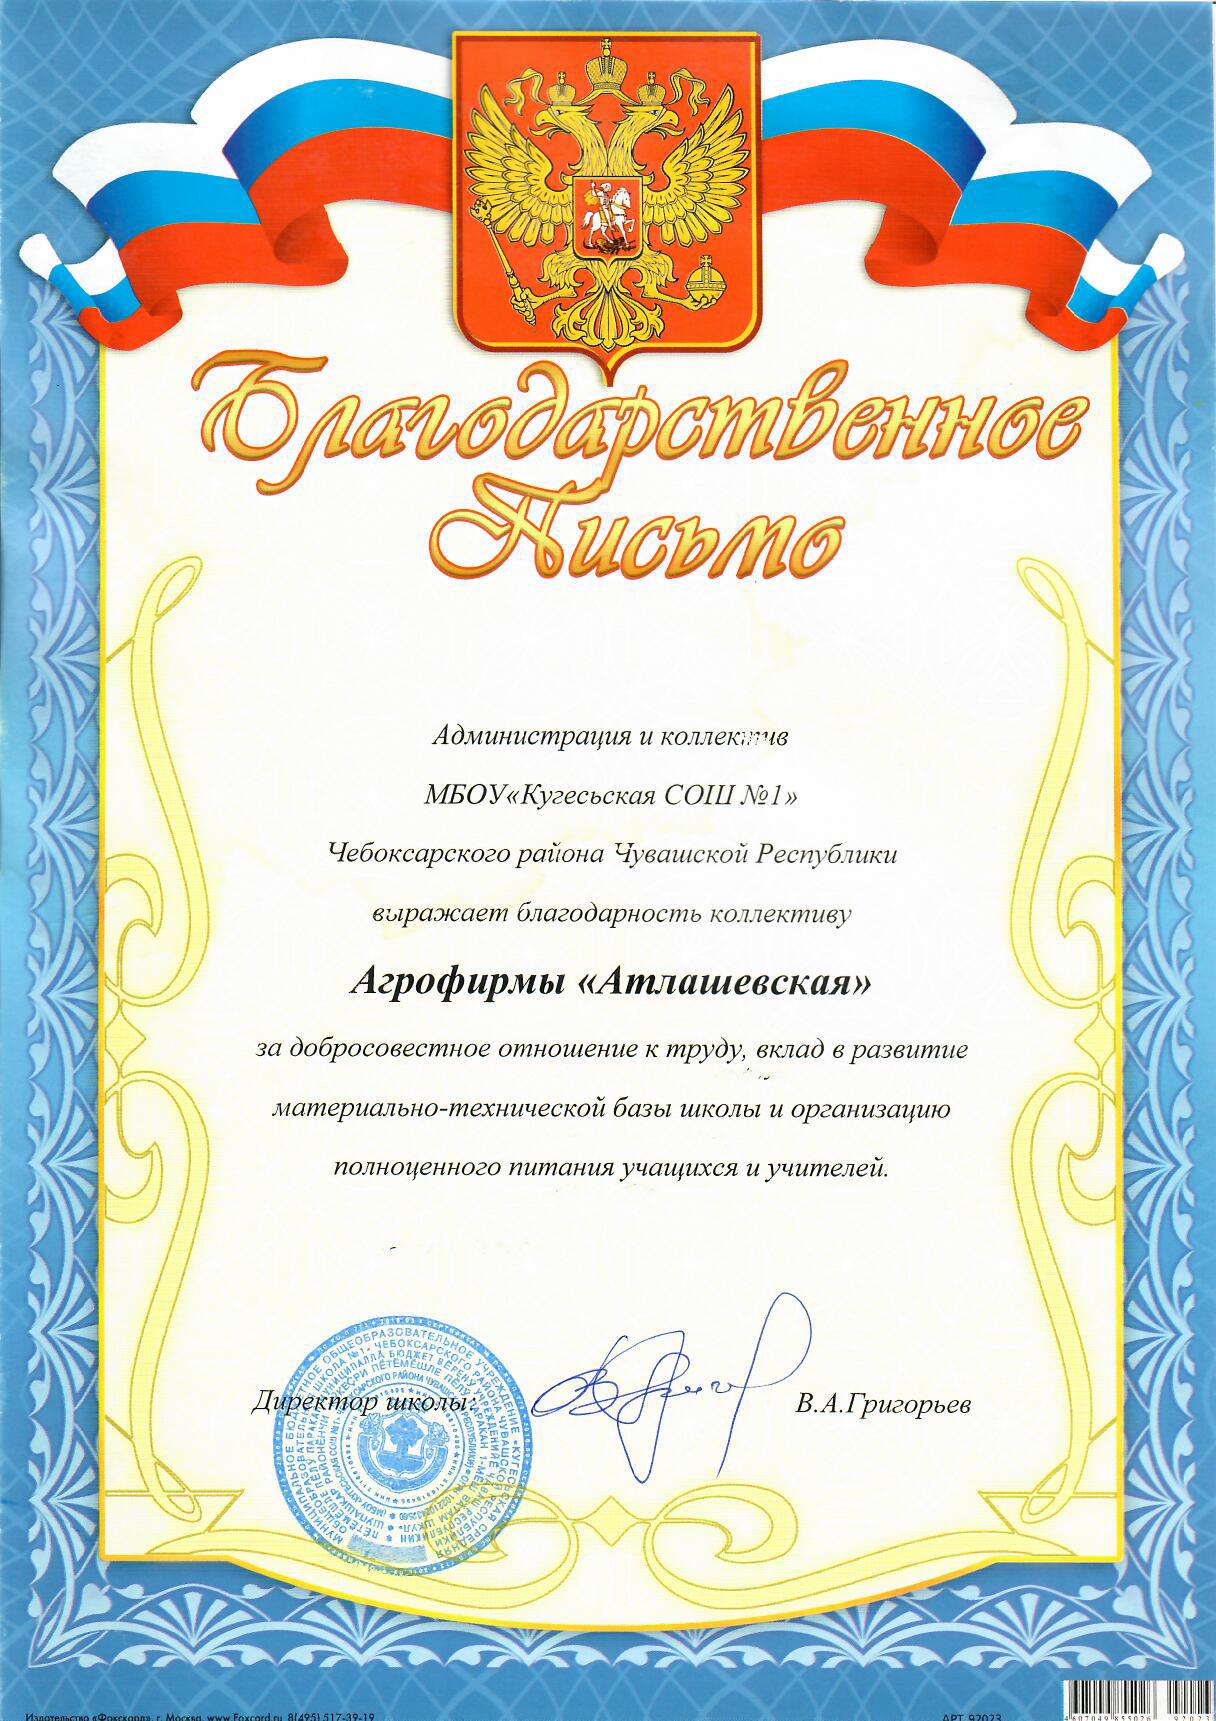 https://static-ru.insales.ru/files/1/6049/4904865/original/Kugesi-SOSH.jpg